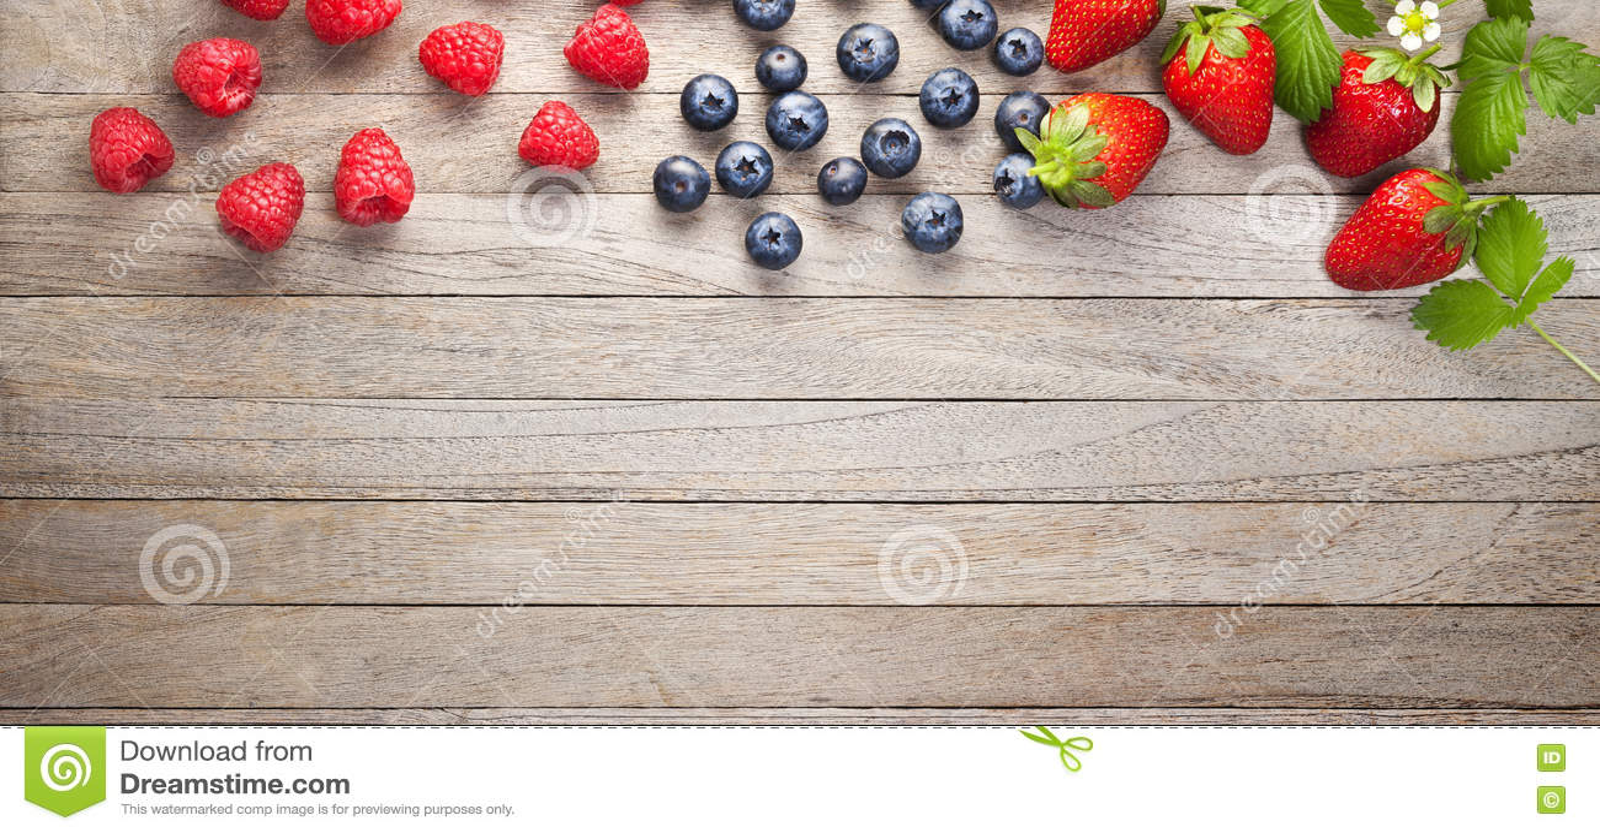 Berries Banner Wood Background